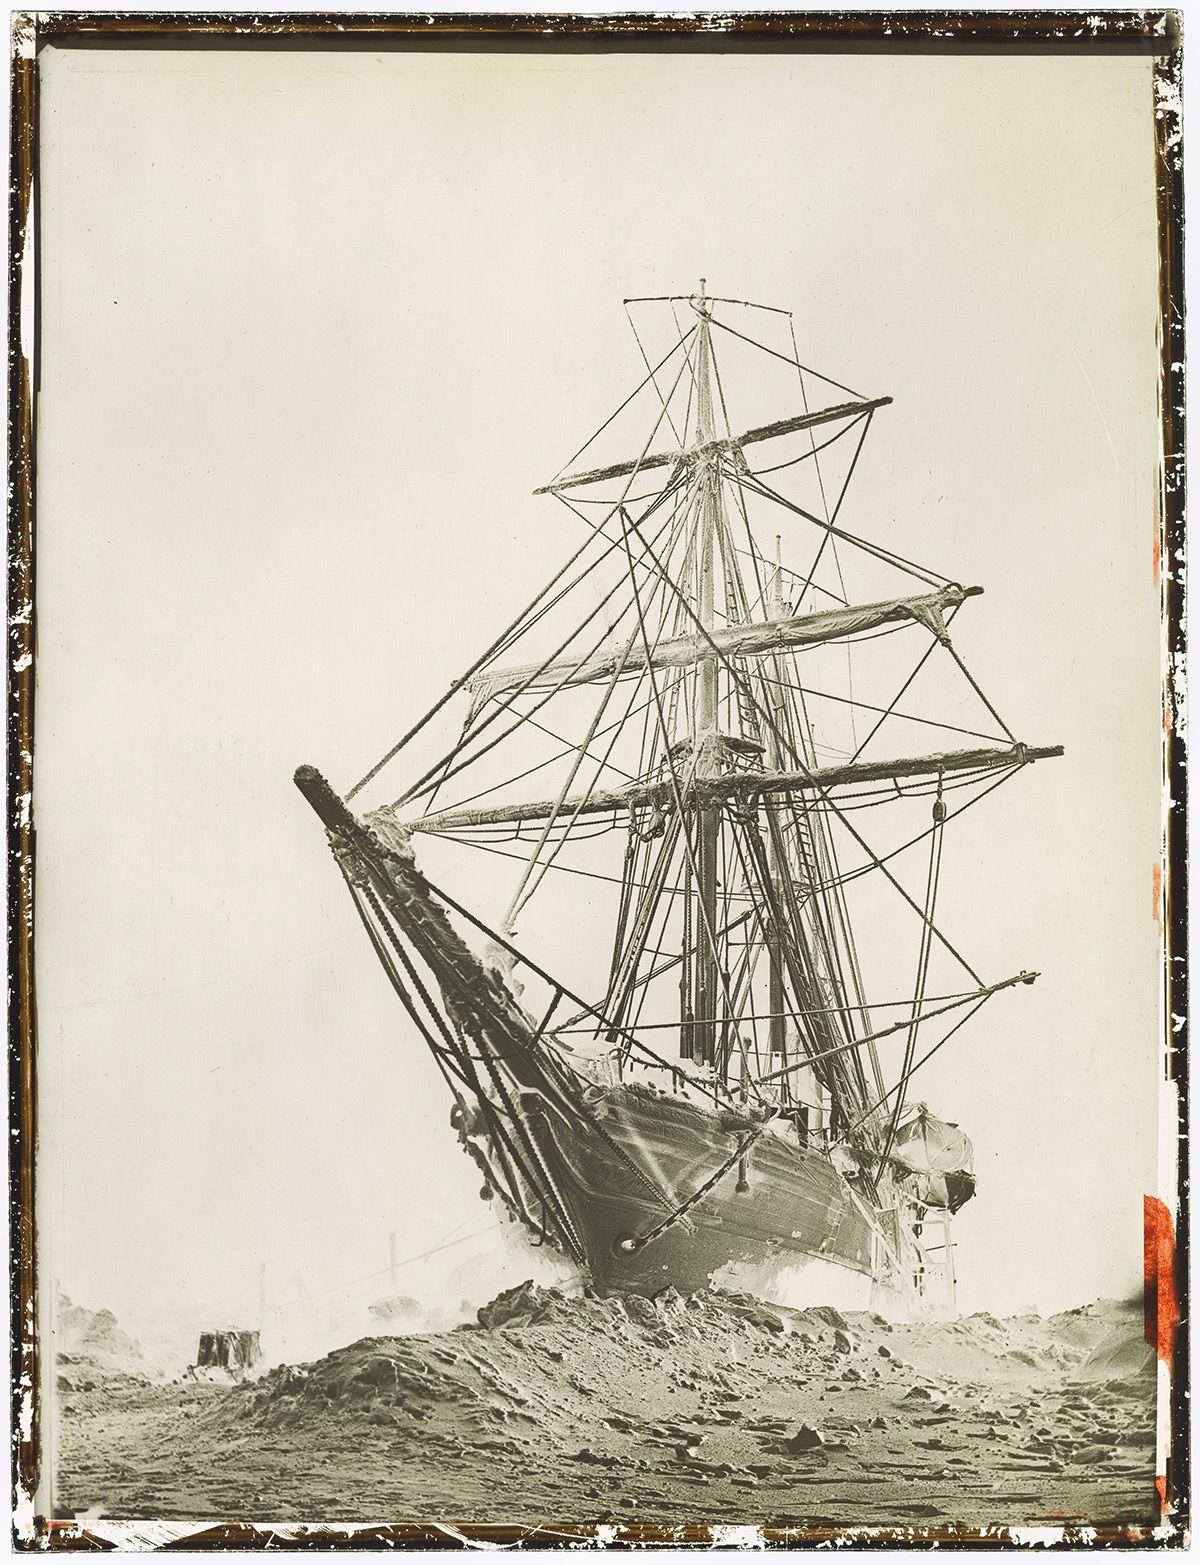 cd30e724d4 Newly Restored Photos of Shackleton's Fateful Antarctic Voyage Offer  Unprecedented Details of Survival